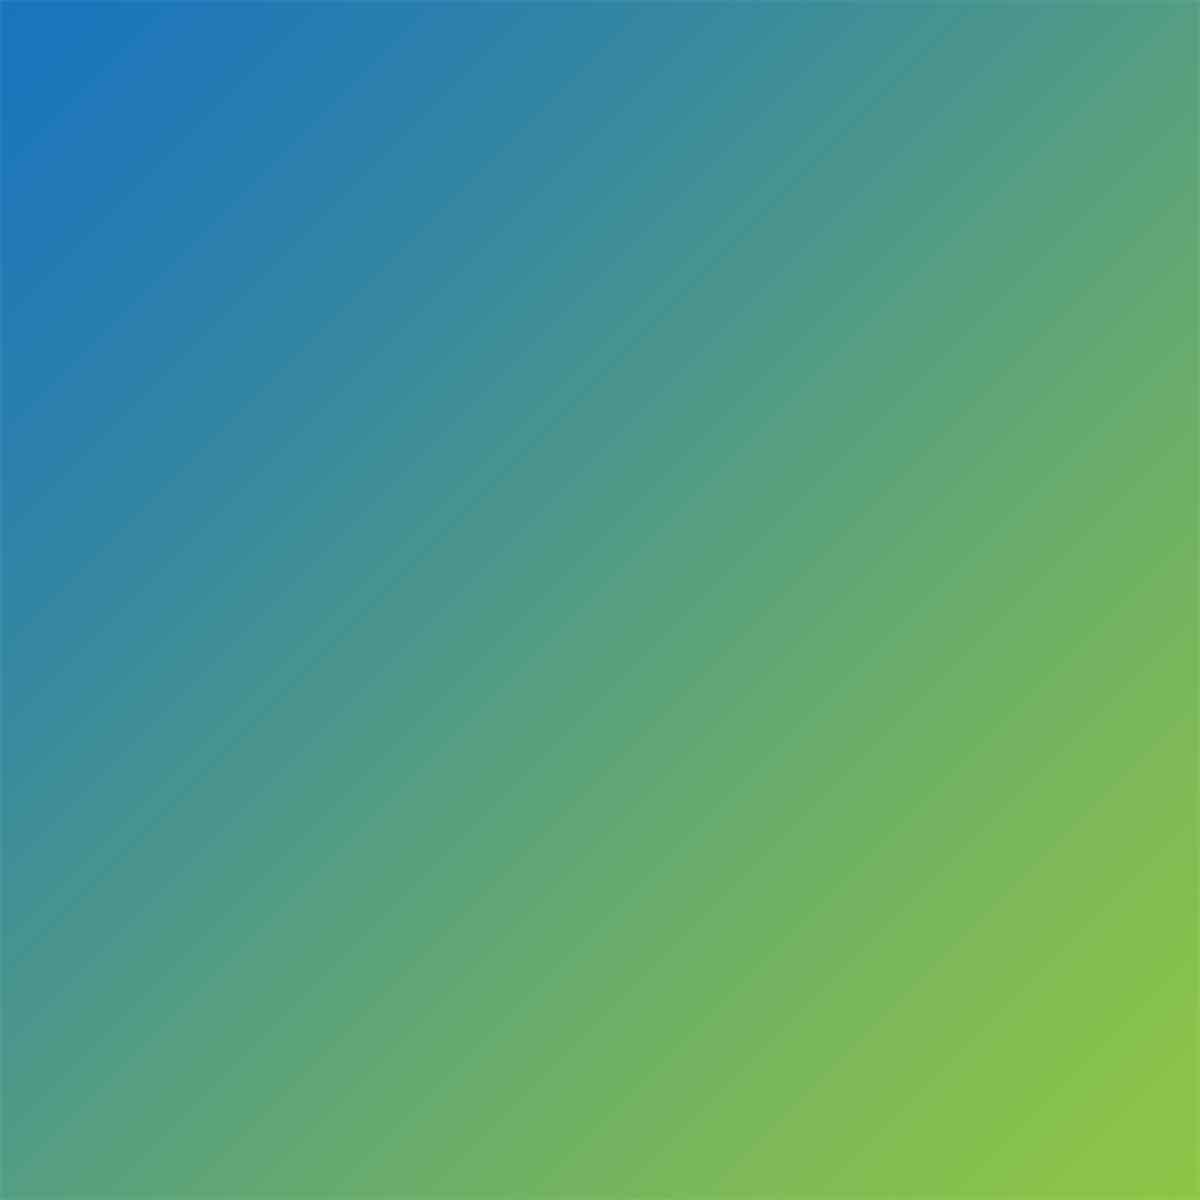 https://www.trekcentralnepal.com/wp-content/uploads/2018/09/bgn-image-box-gradient.jpg